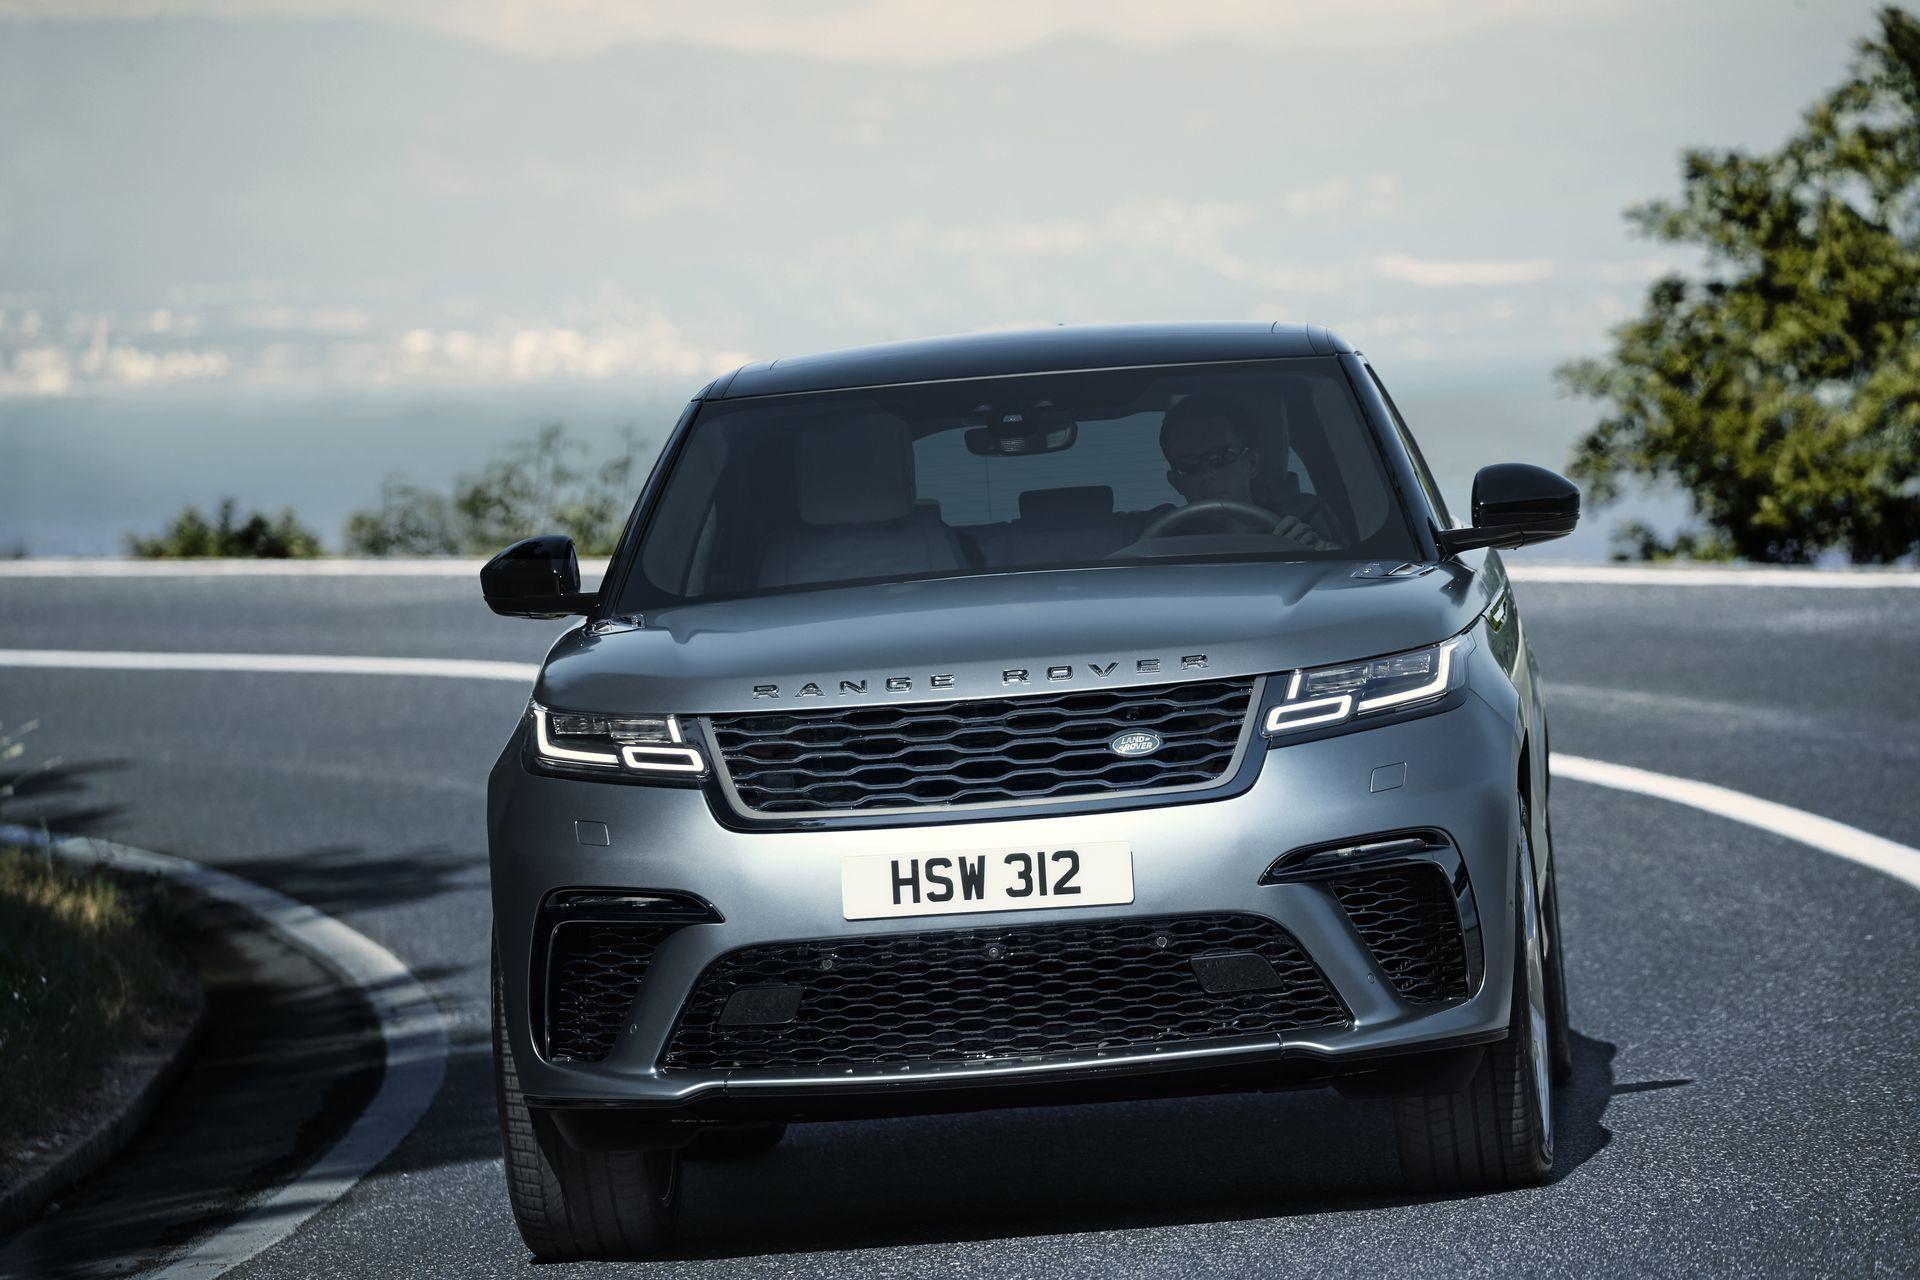 Range Rover Velar Svautobiography 11